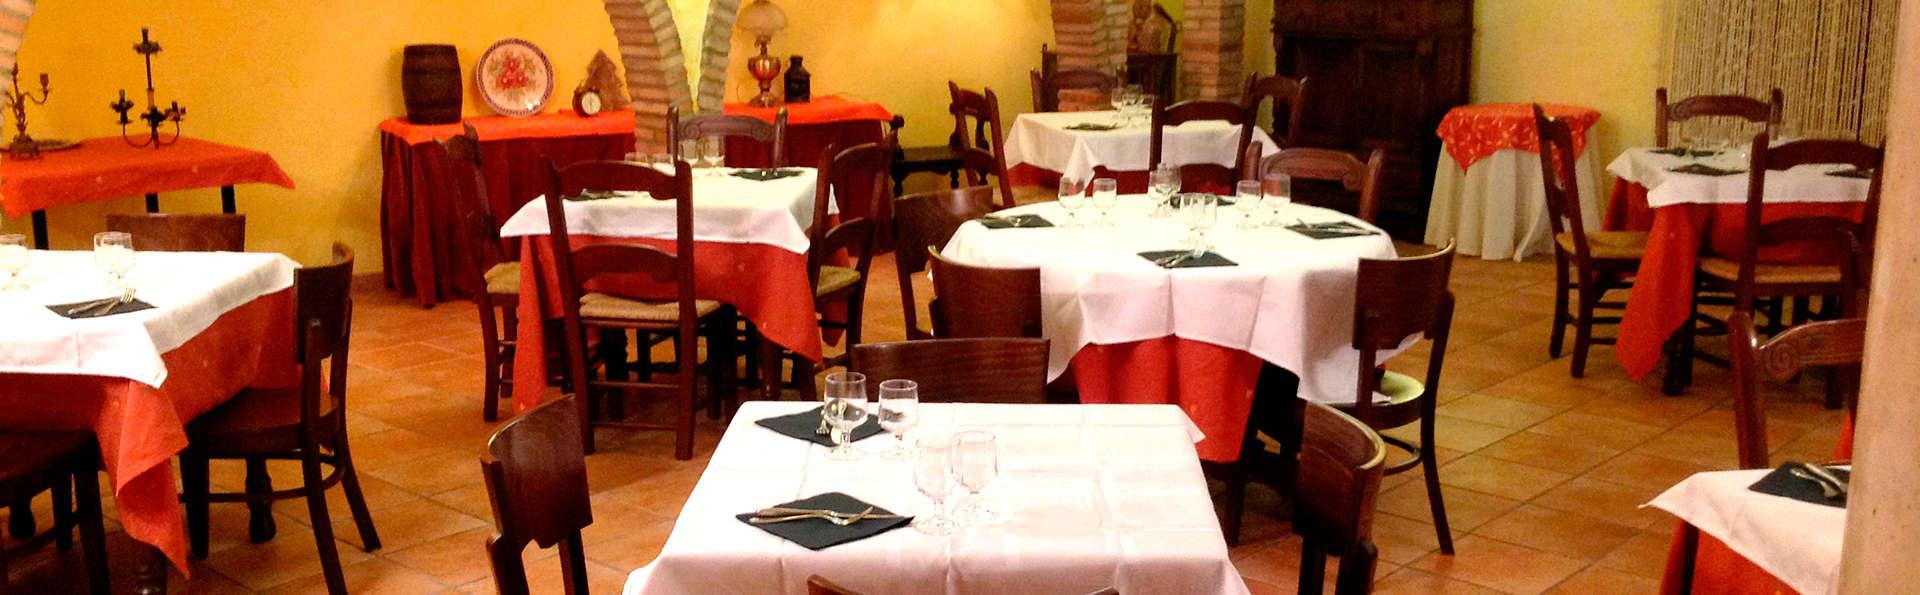 Hotel Abadia Puebla de Arenoso - EDIT_restaurant.jpg